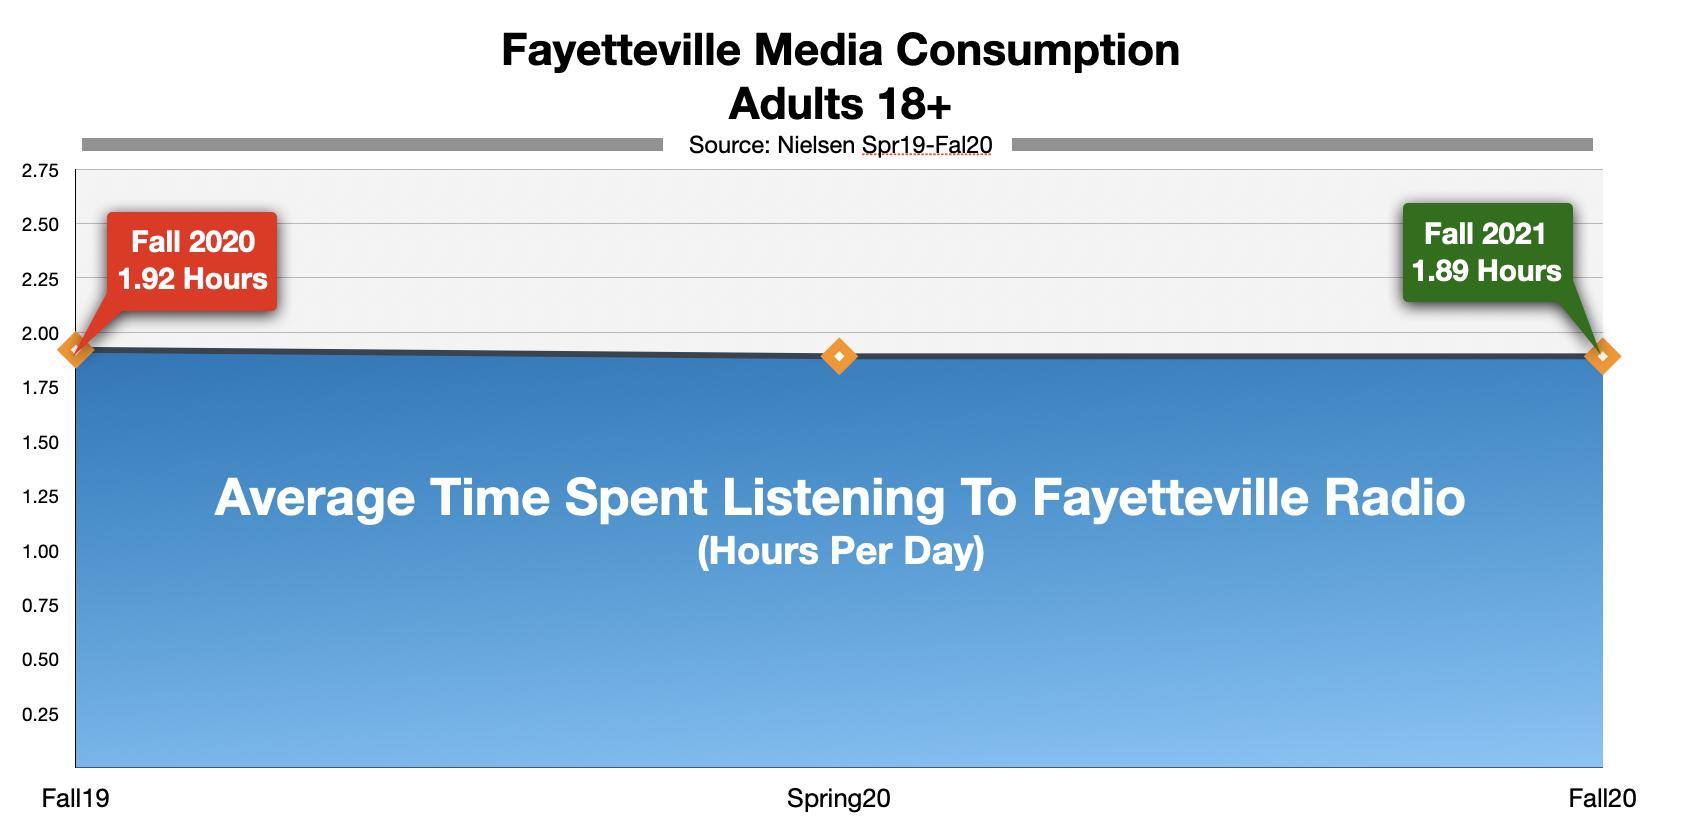 Advertising on Fayetteville Radio Time-Spent-Listening 2021